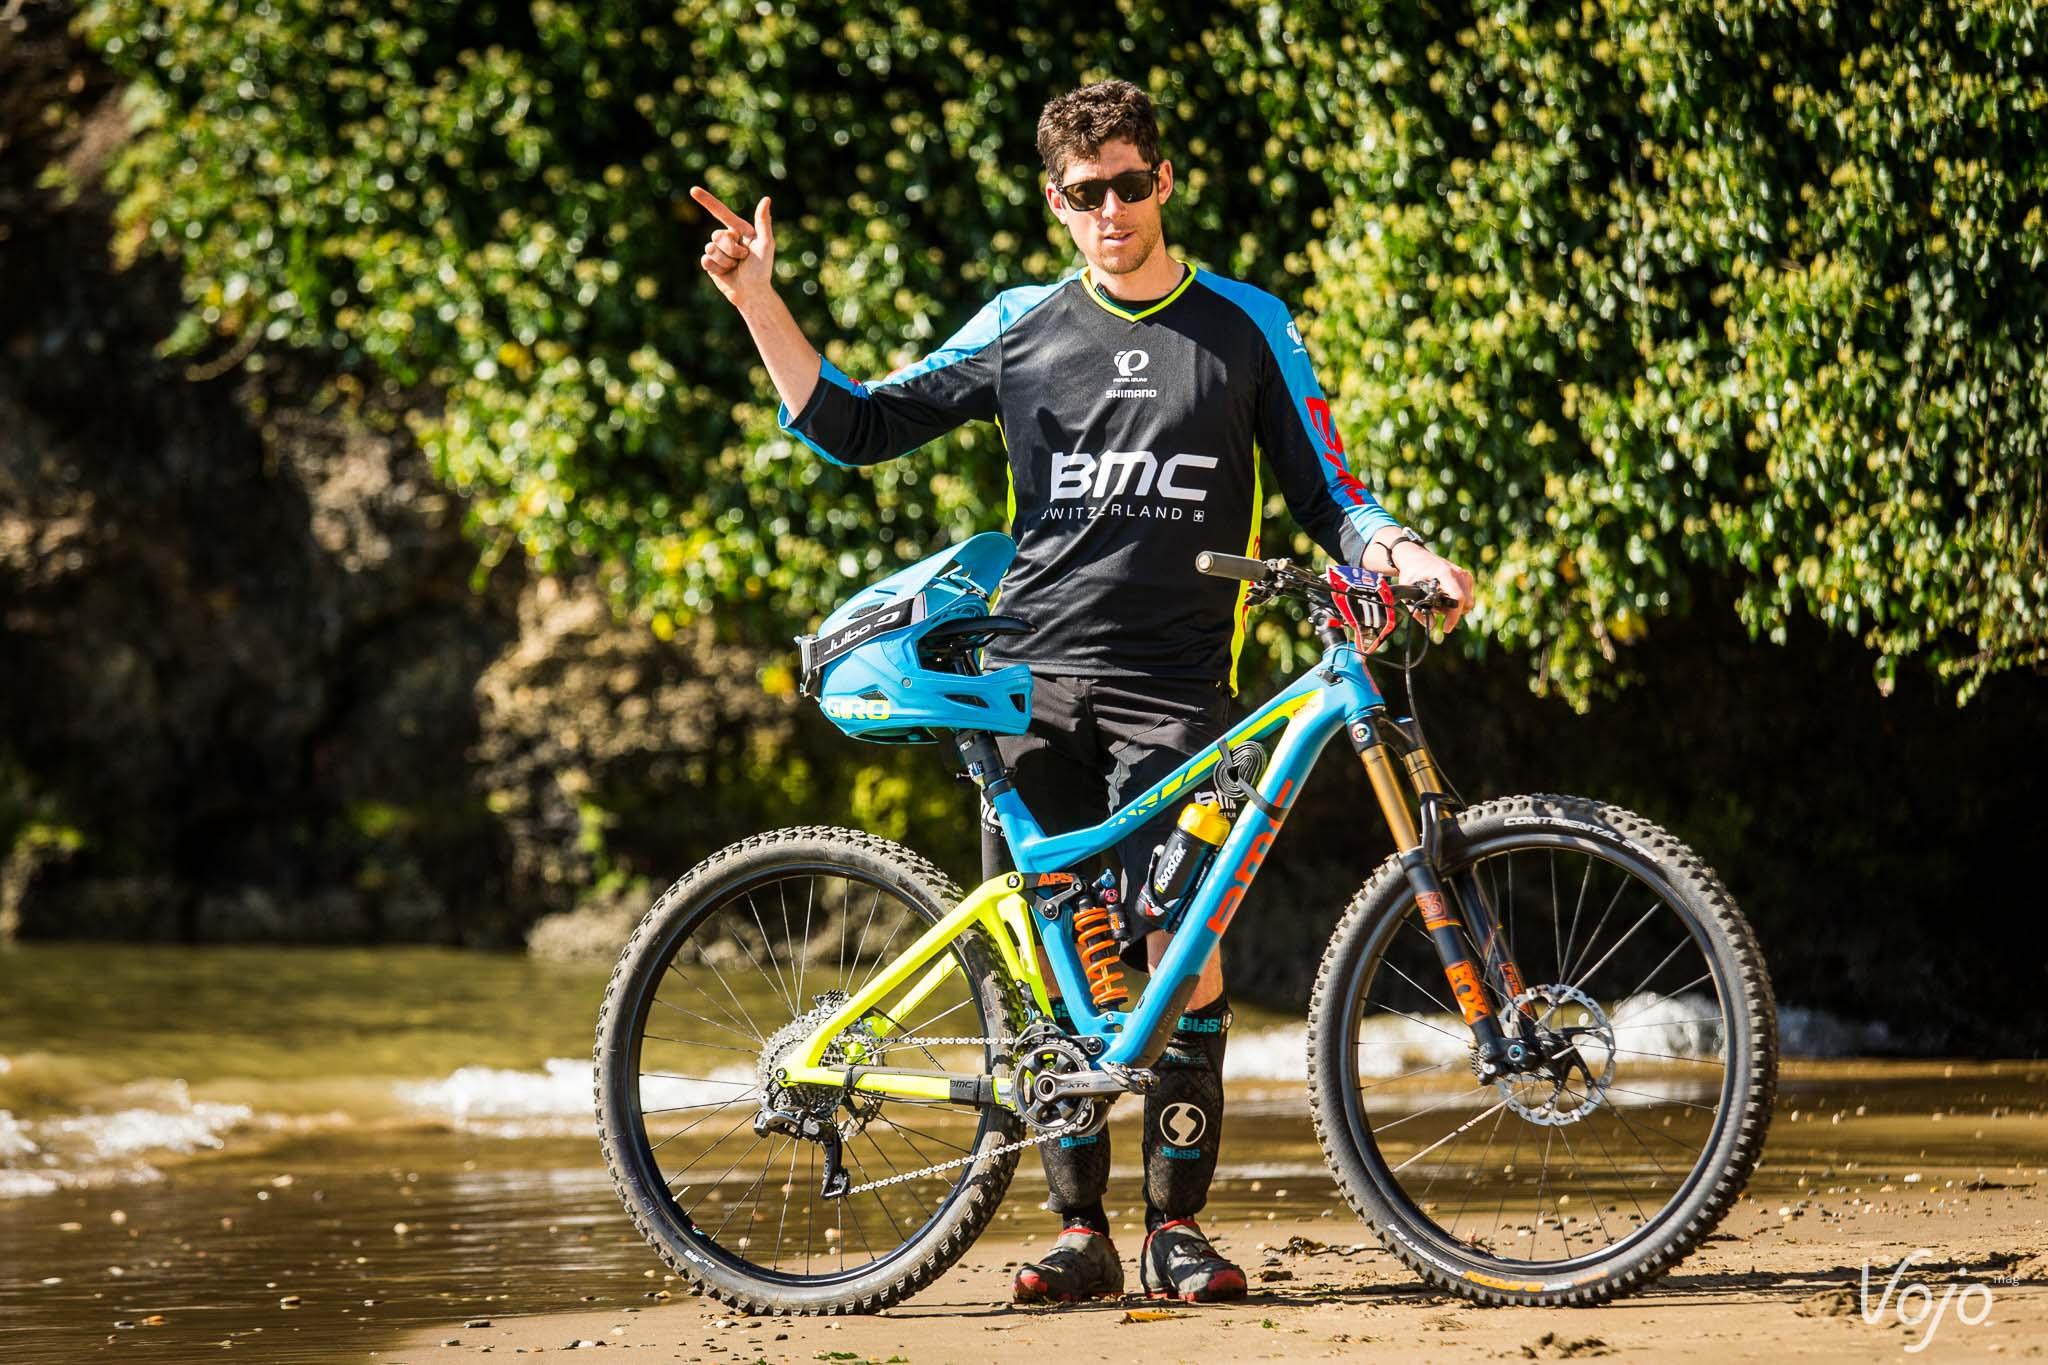 Francois_Bailly_Maitre_BMC_TrailFox_Bikecheck_Copyright_OBeart_VojoMag-1